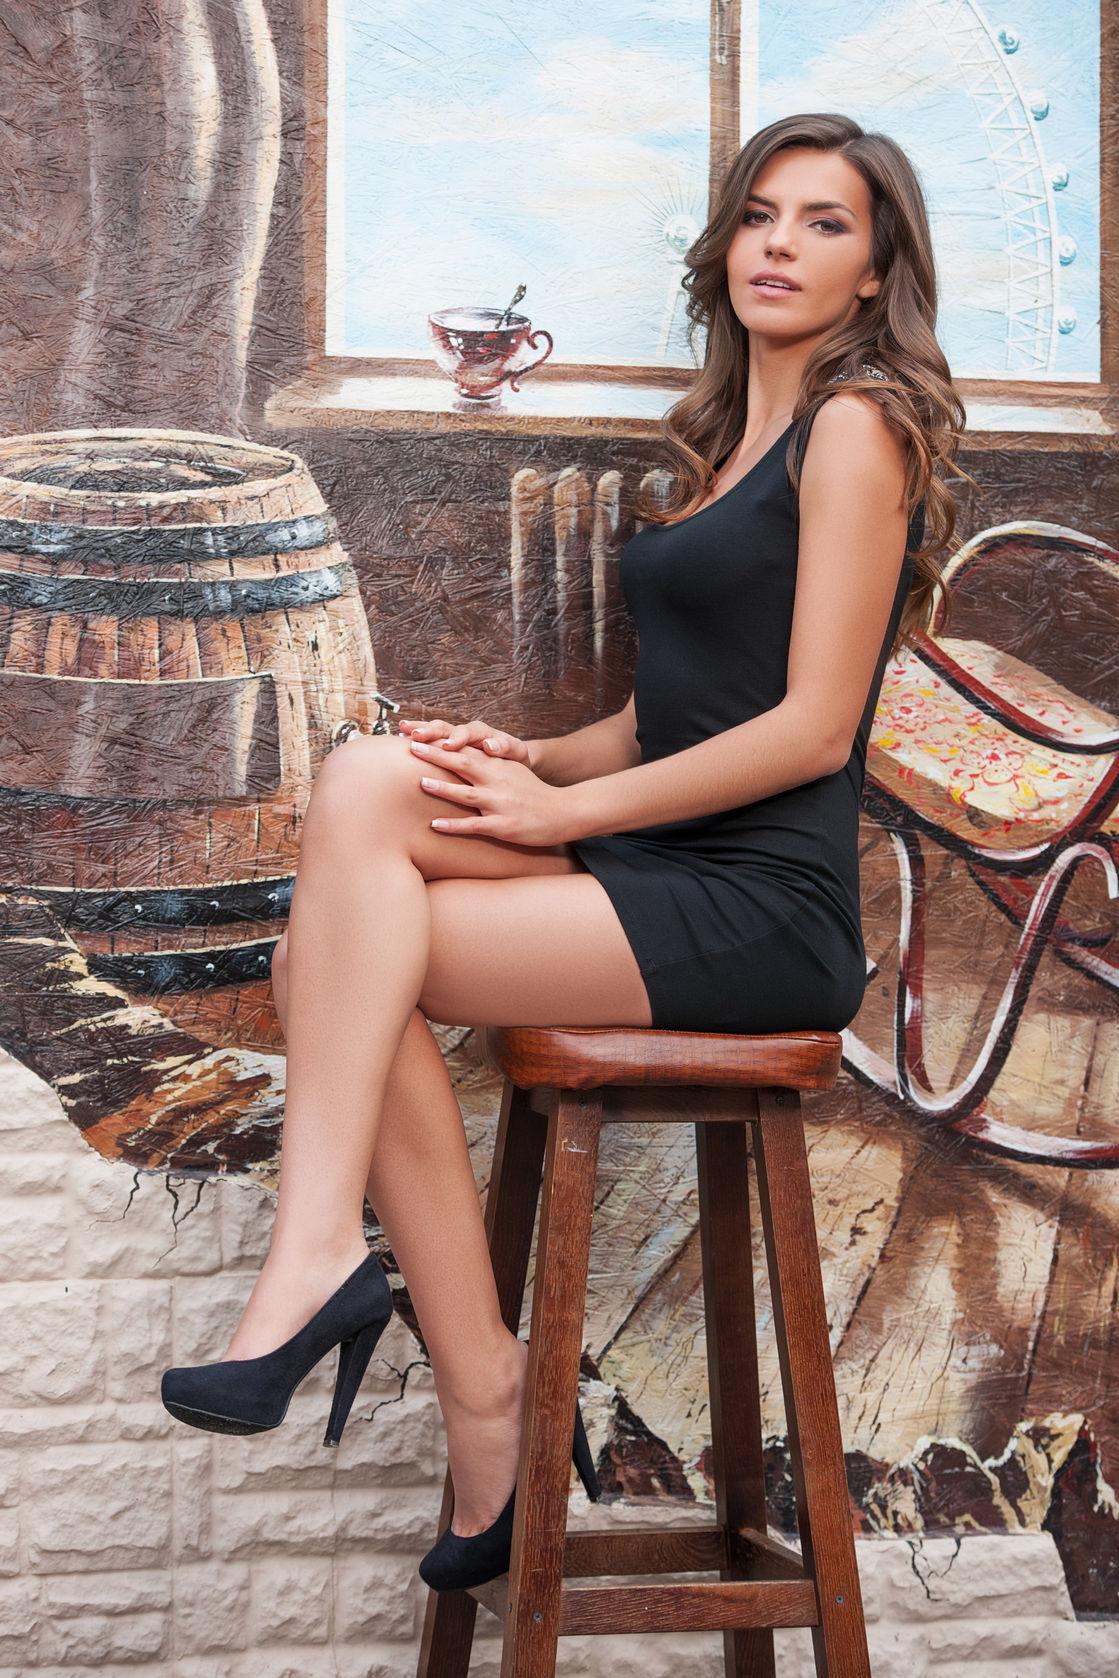 Women with beautiful legs opinion you